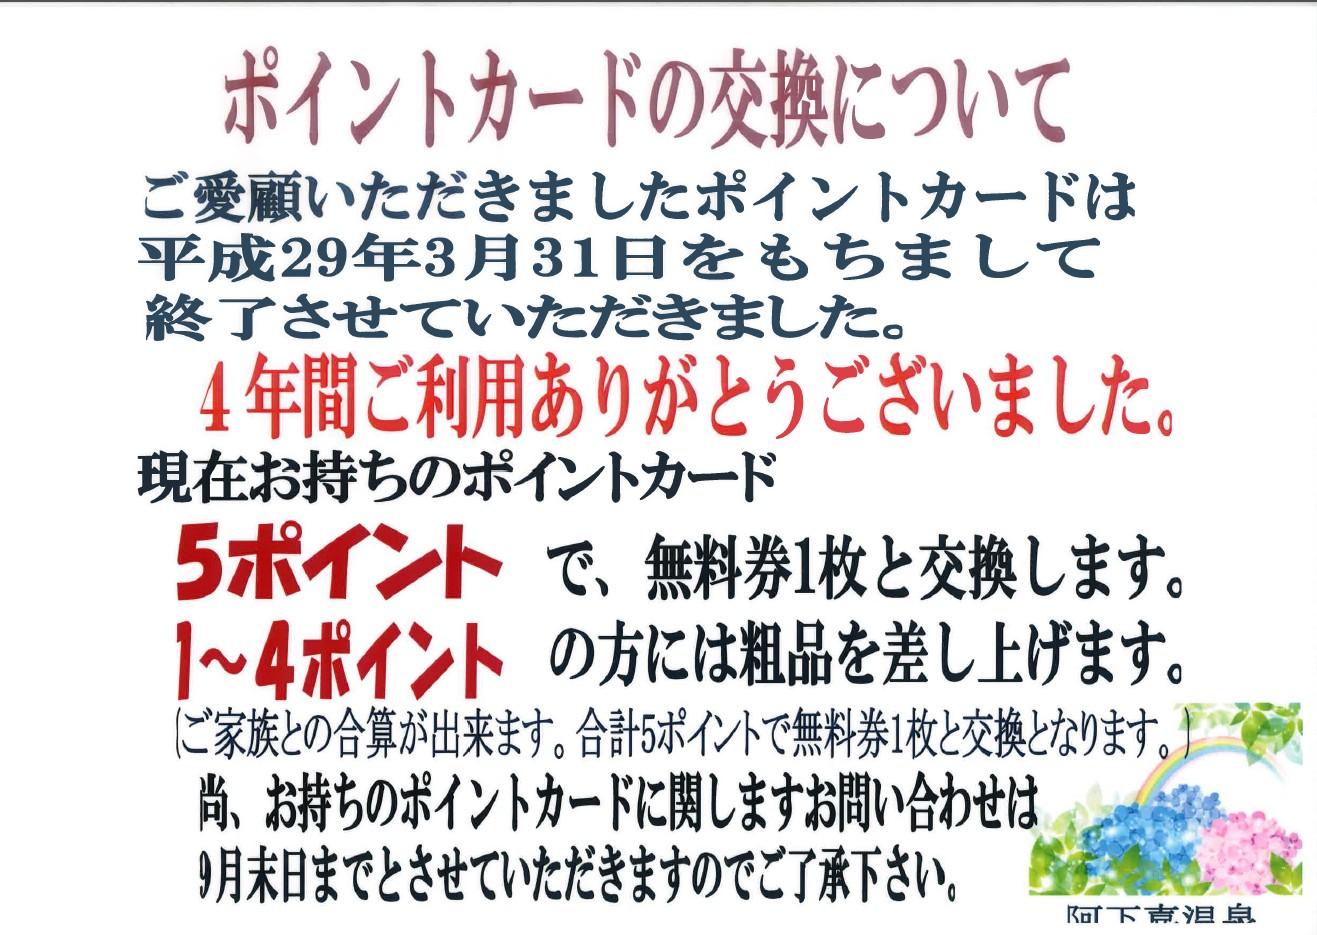 http://www.ajisainosato.com/info/images/2017y03m30d_083940005.jpg